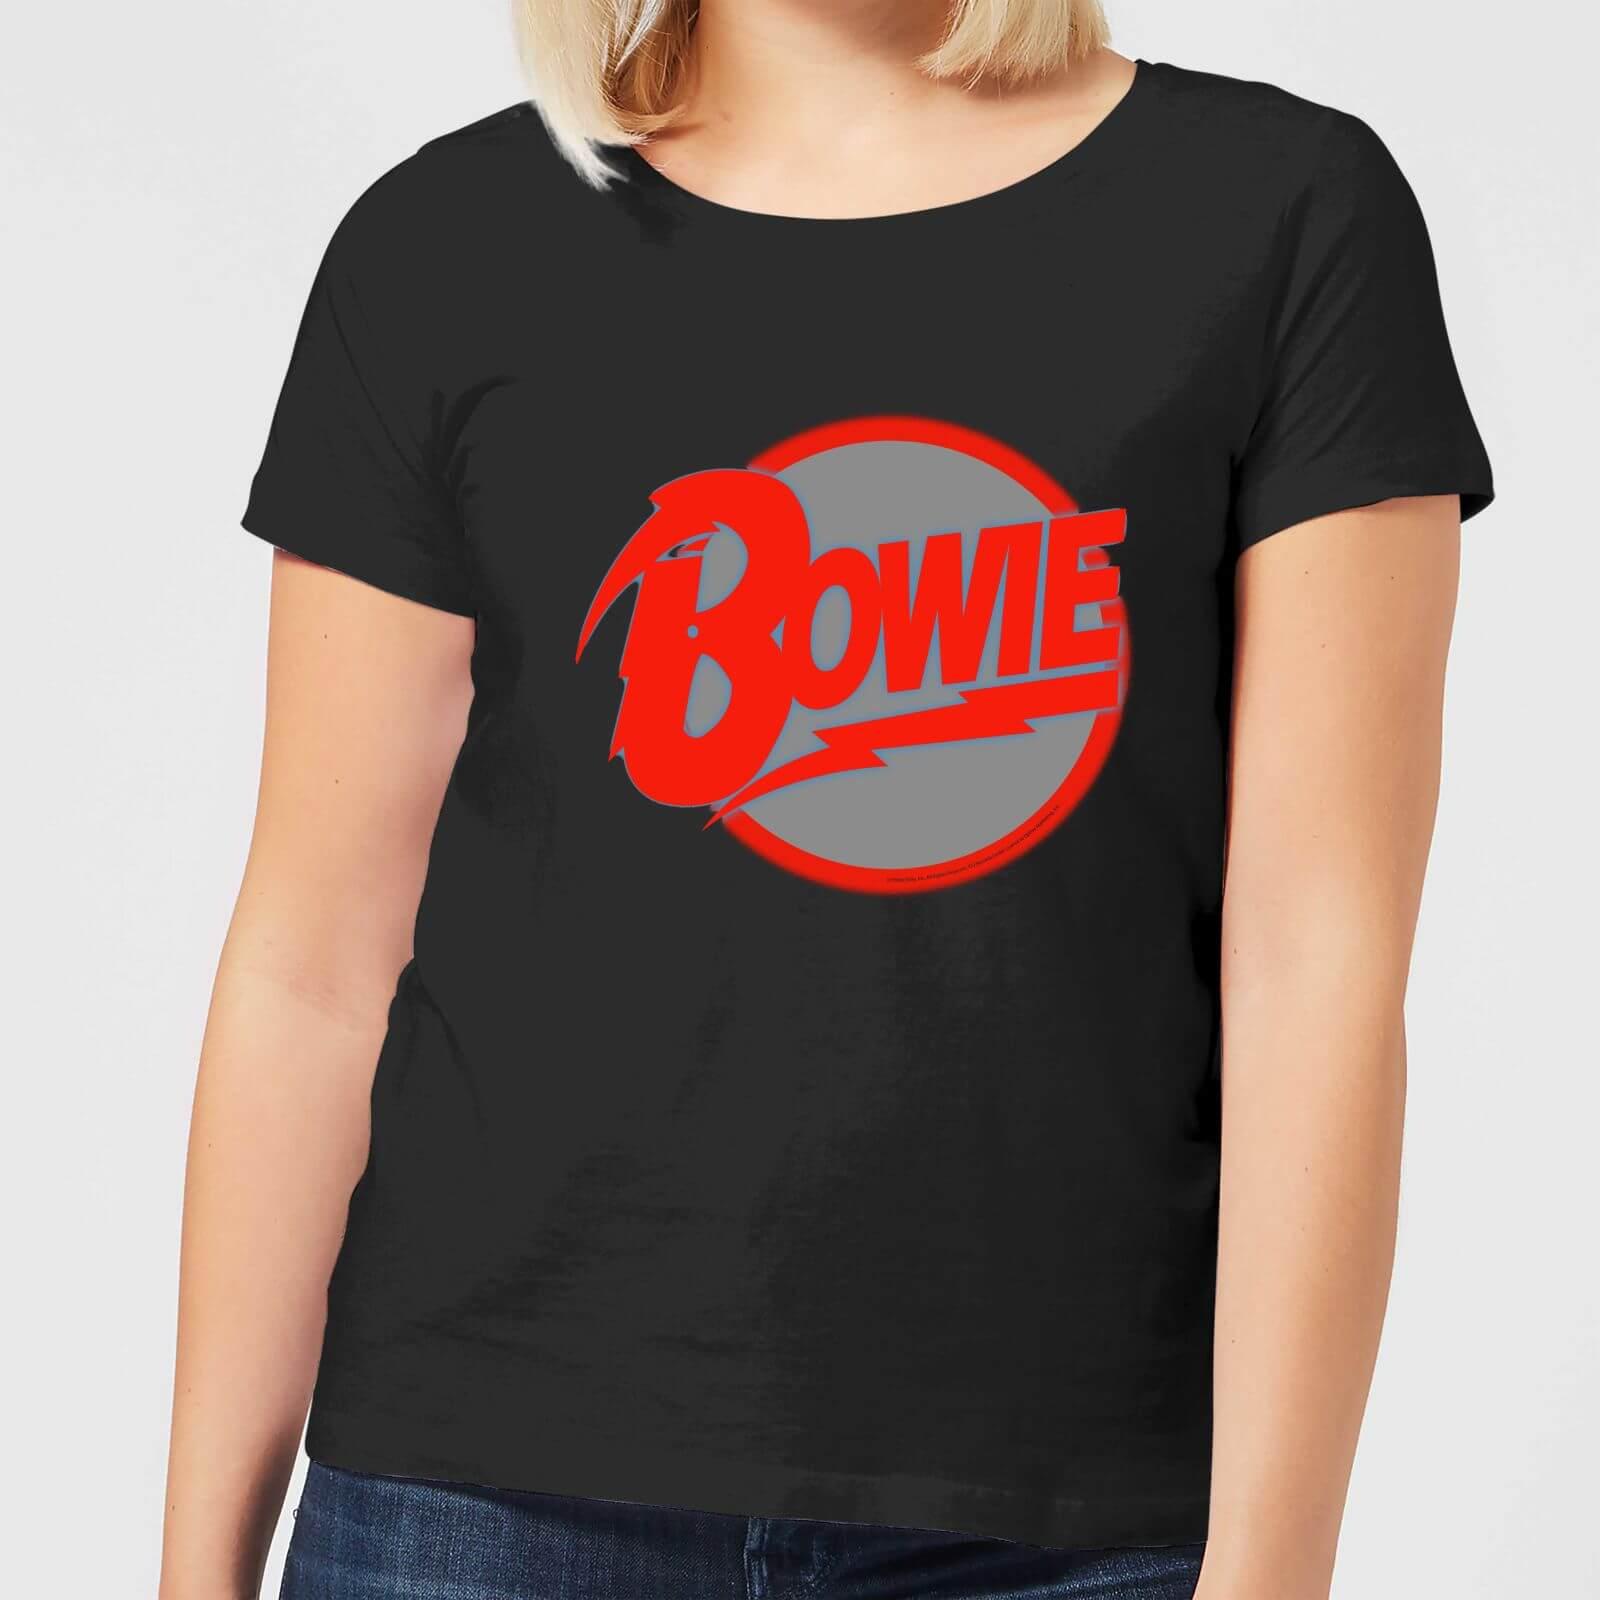 David Bowie Diamond Dogs Women's T-Shirt - Black - XS - Black